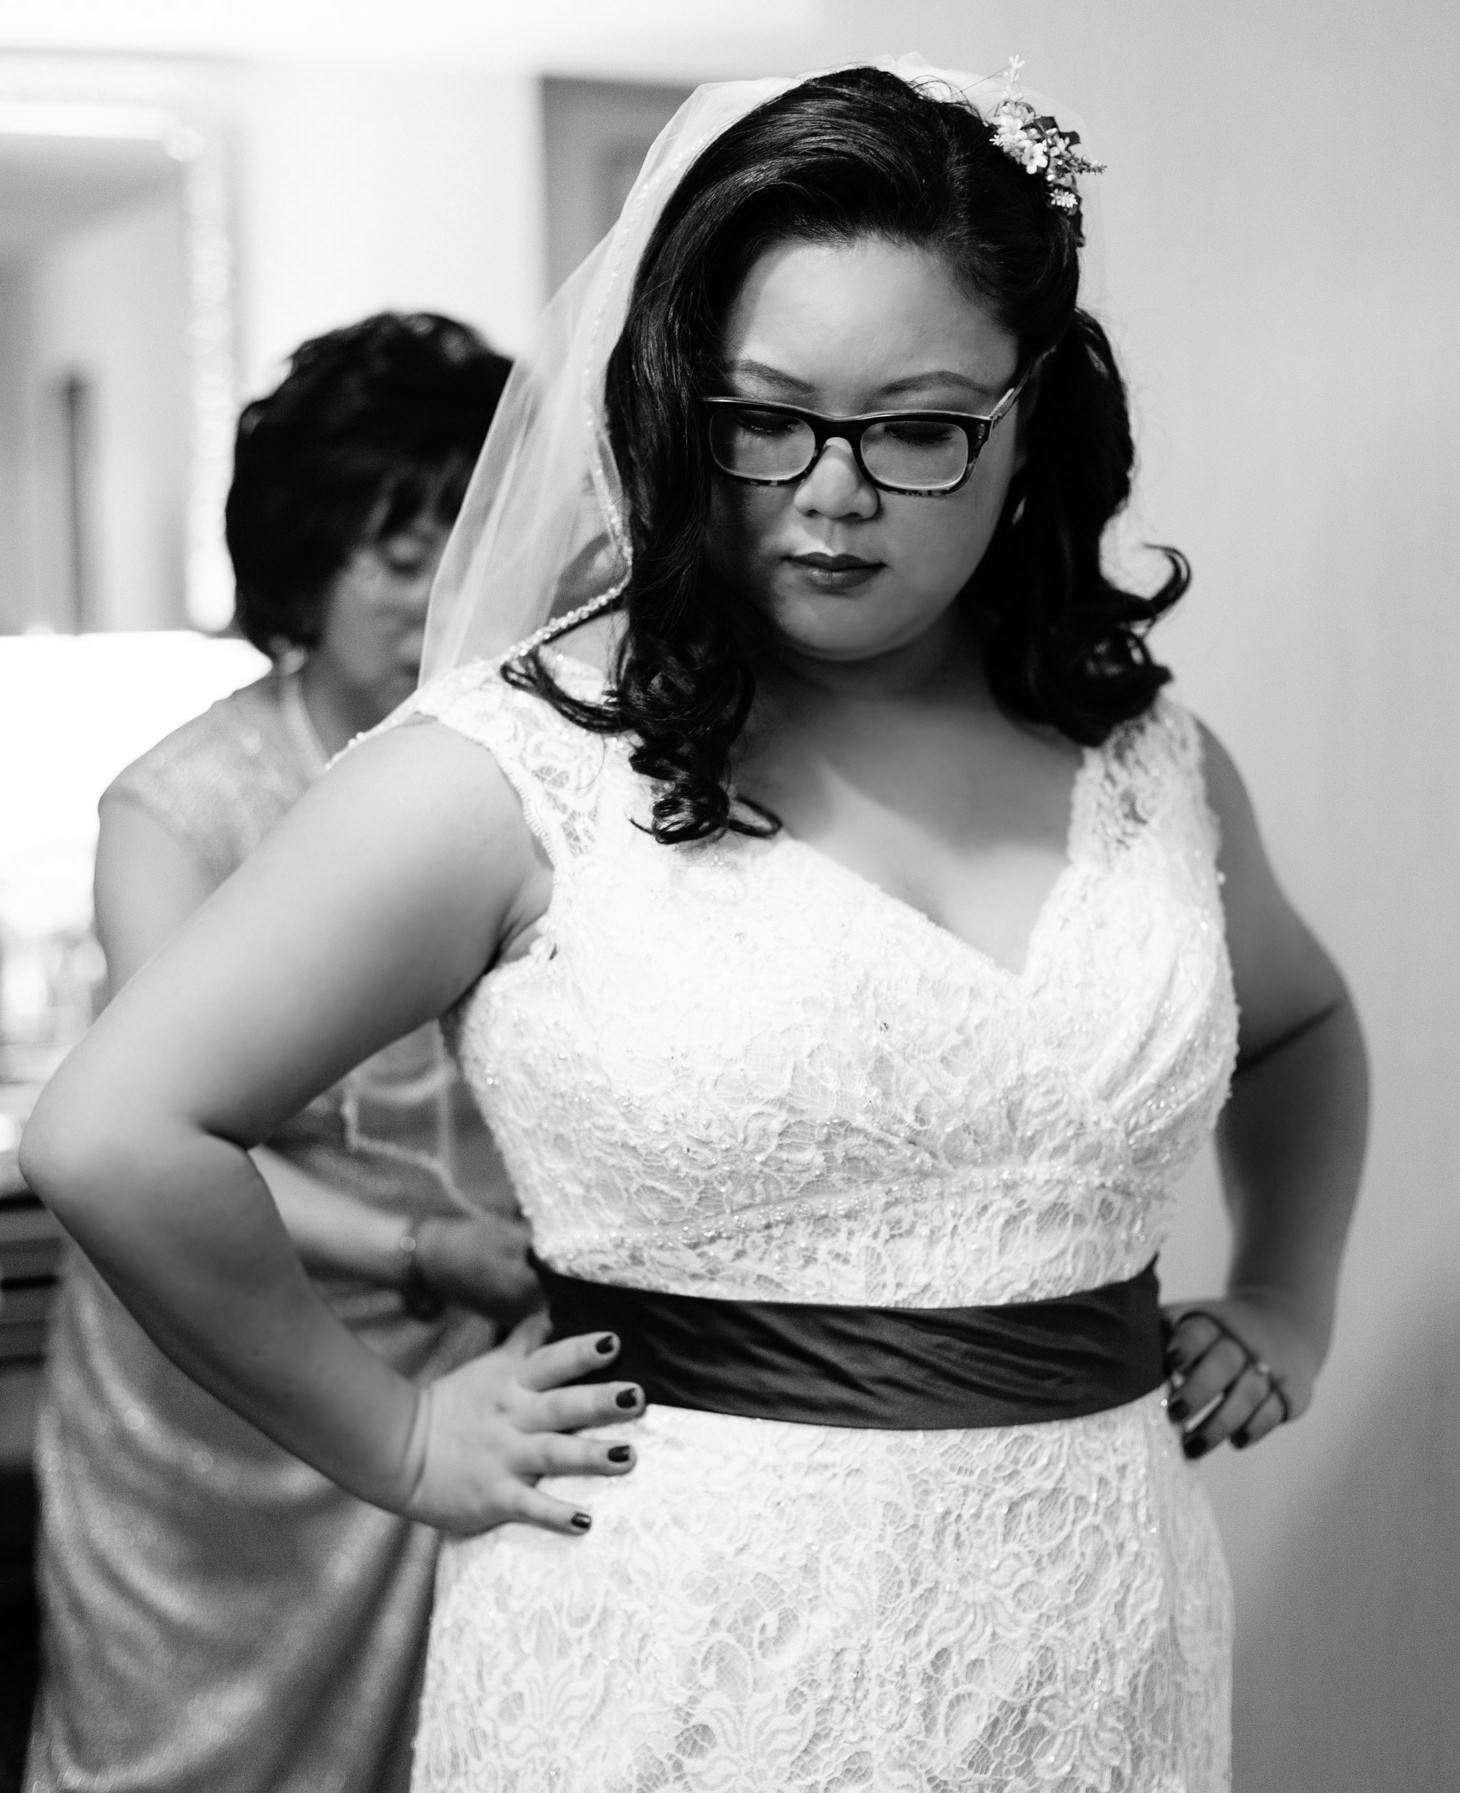 017-nyc-wedding-portrait-photographer-times-square-muse-hotel-winter-wedding-smitten-chickens.jpg